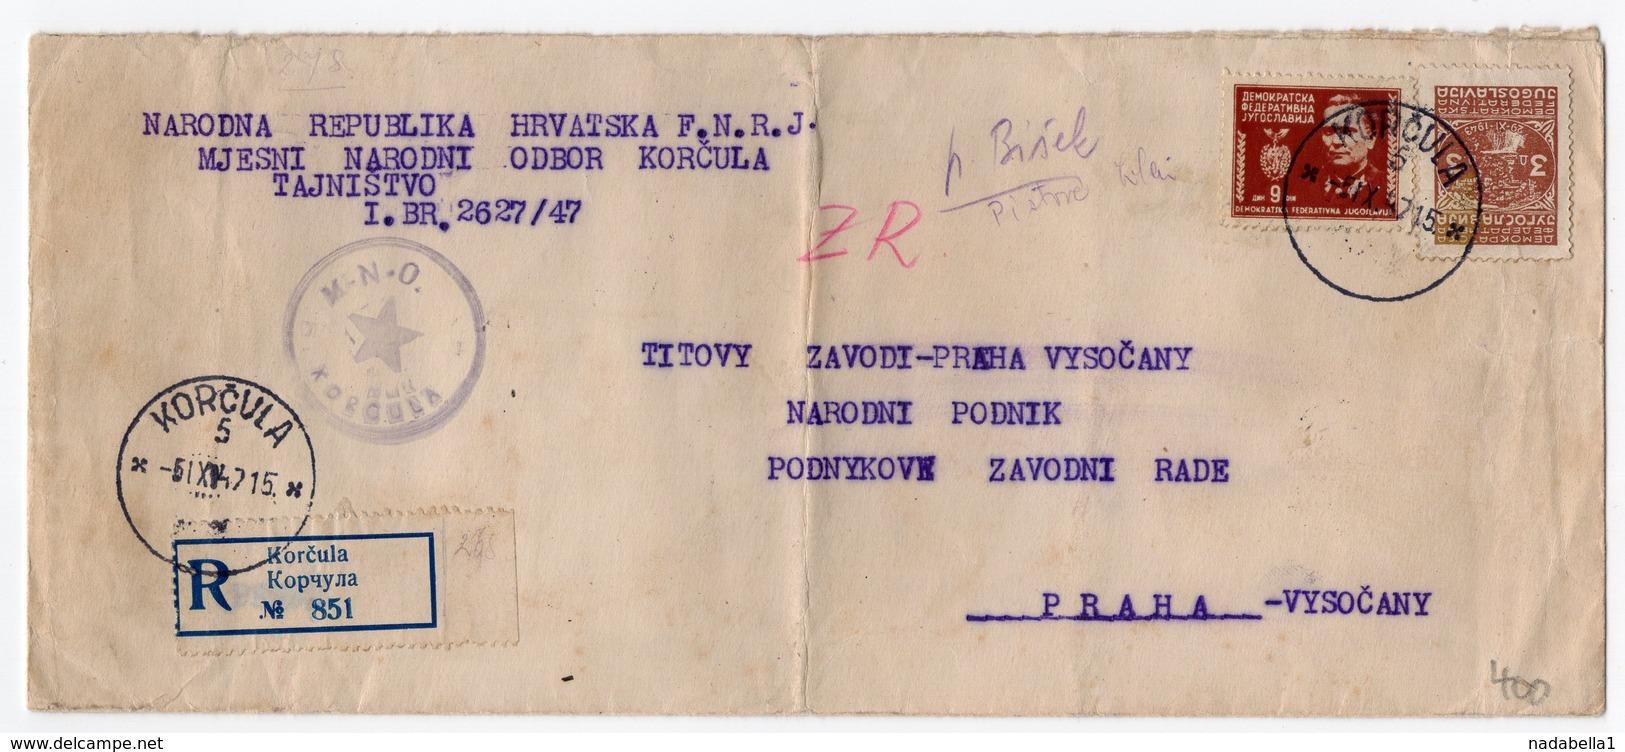 1947 YUGOSLAVIA, CROATIA, KORCULA TO PRAHA, CZECHOSLOVAKIA, REGISTERED MAIL - 1945-1992 Socialist Federal Republic Of Yugoslavia